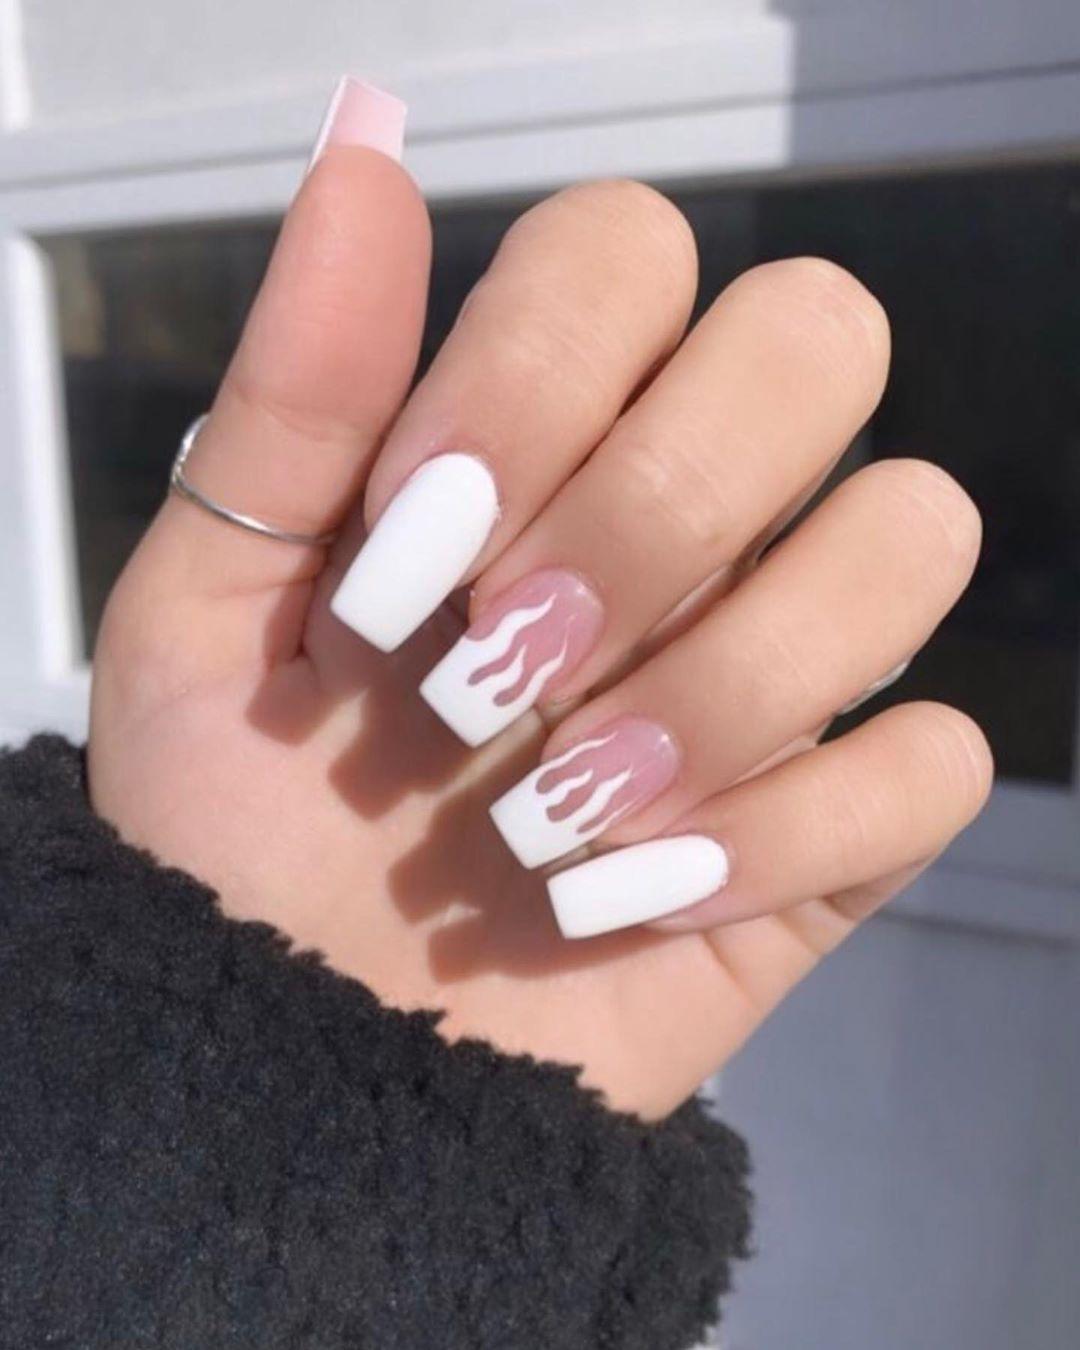 Acylicnails Baddie Glitternails Nail Fairy Nails Like Follow Followme Nailfie Flames Wh Square Acrylic Nails Fake Nails Short Acrylic Nails Designs